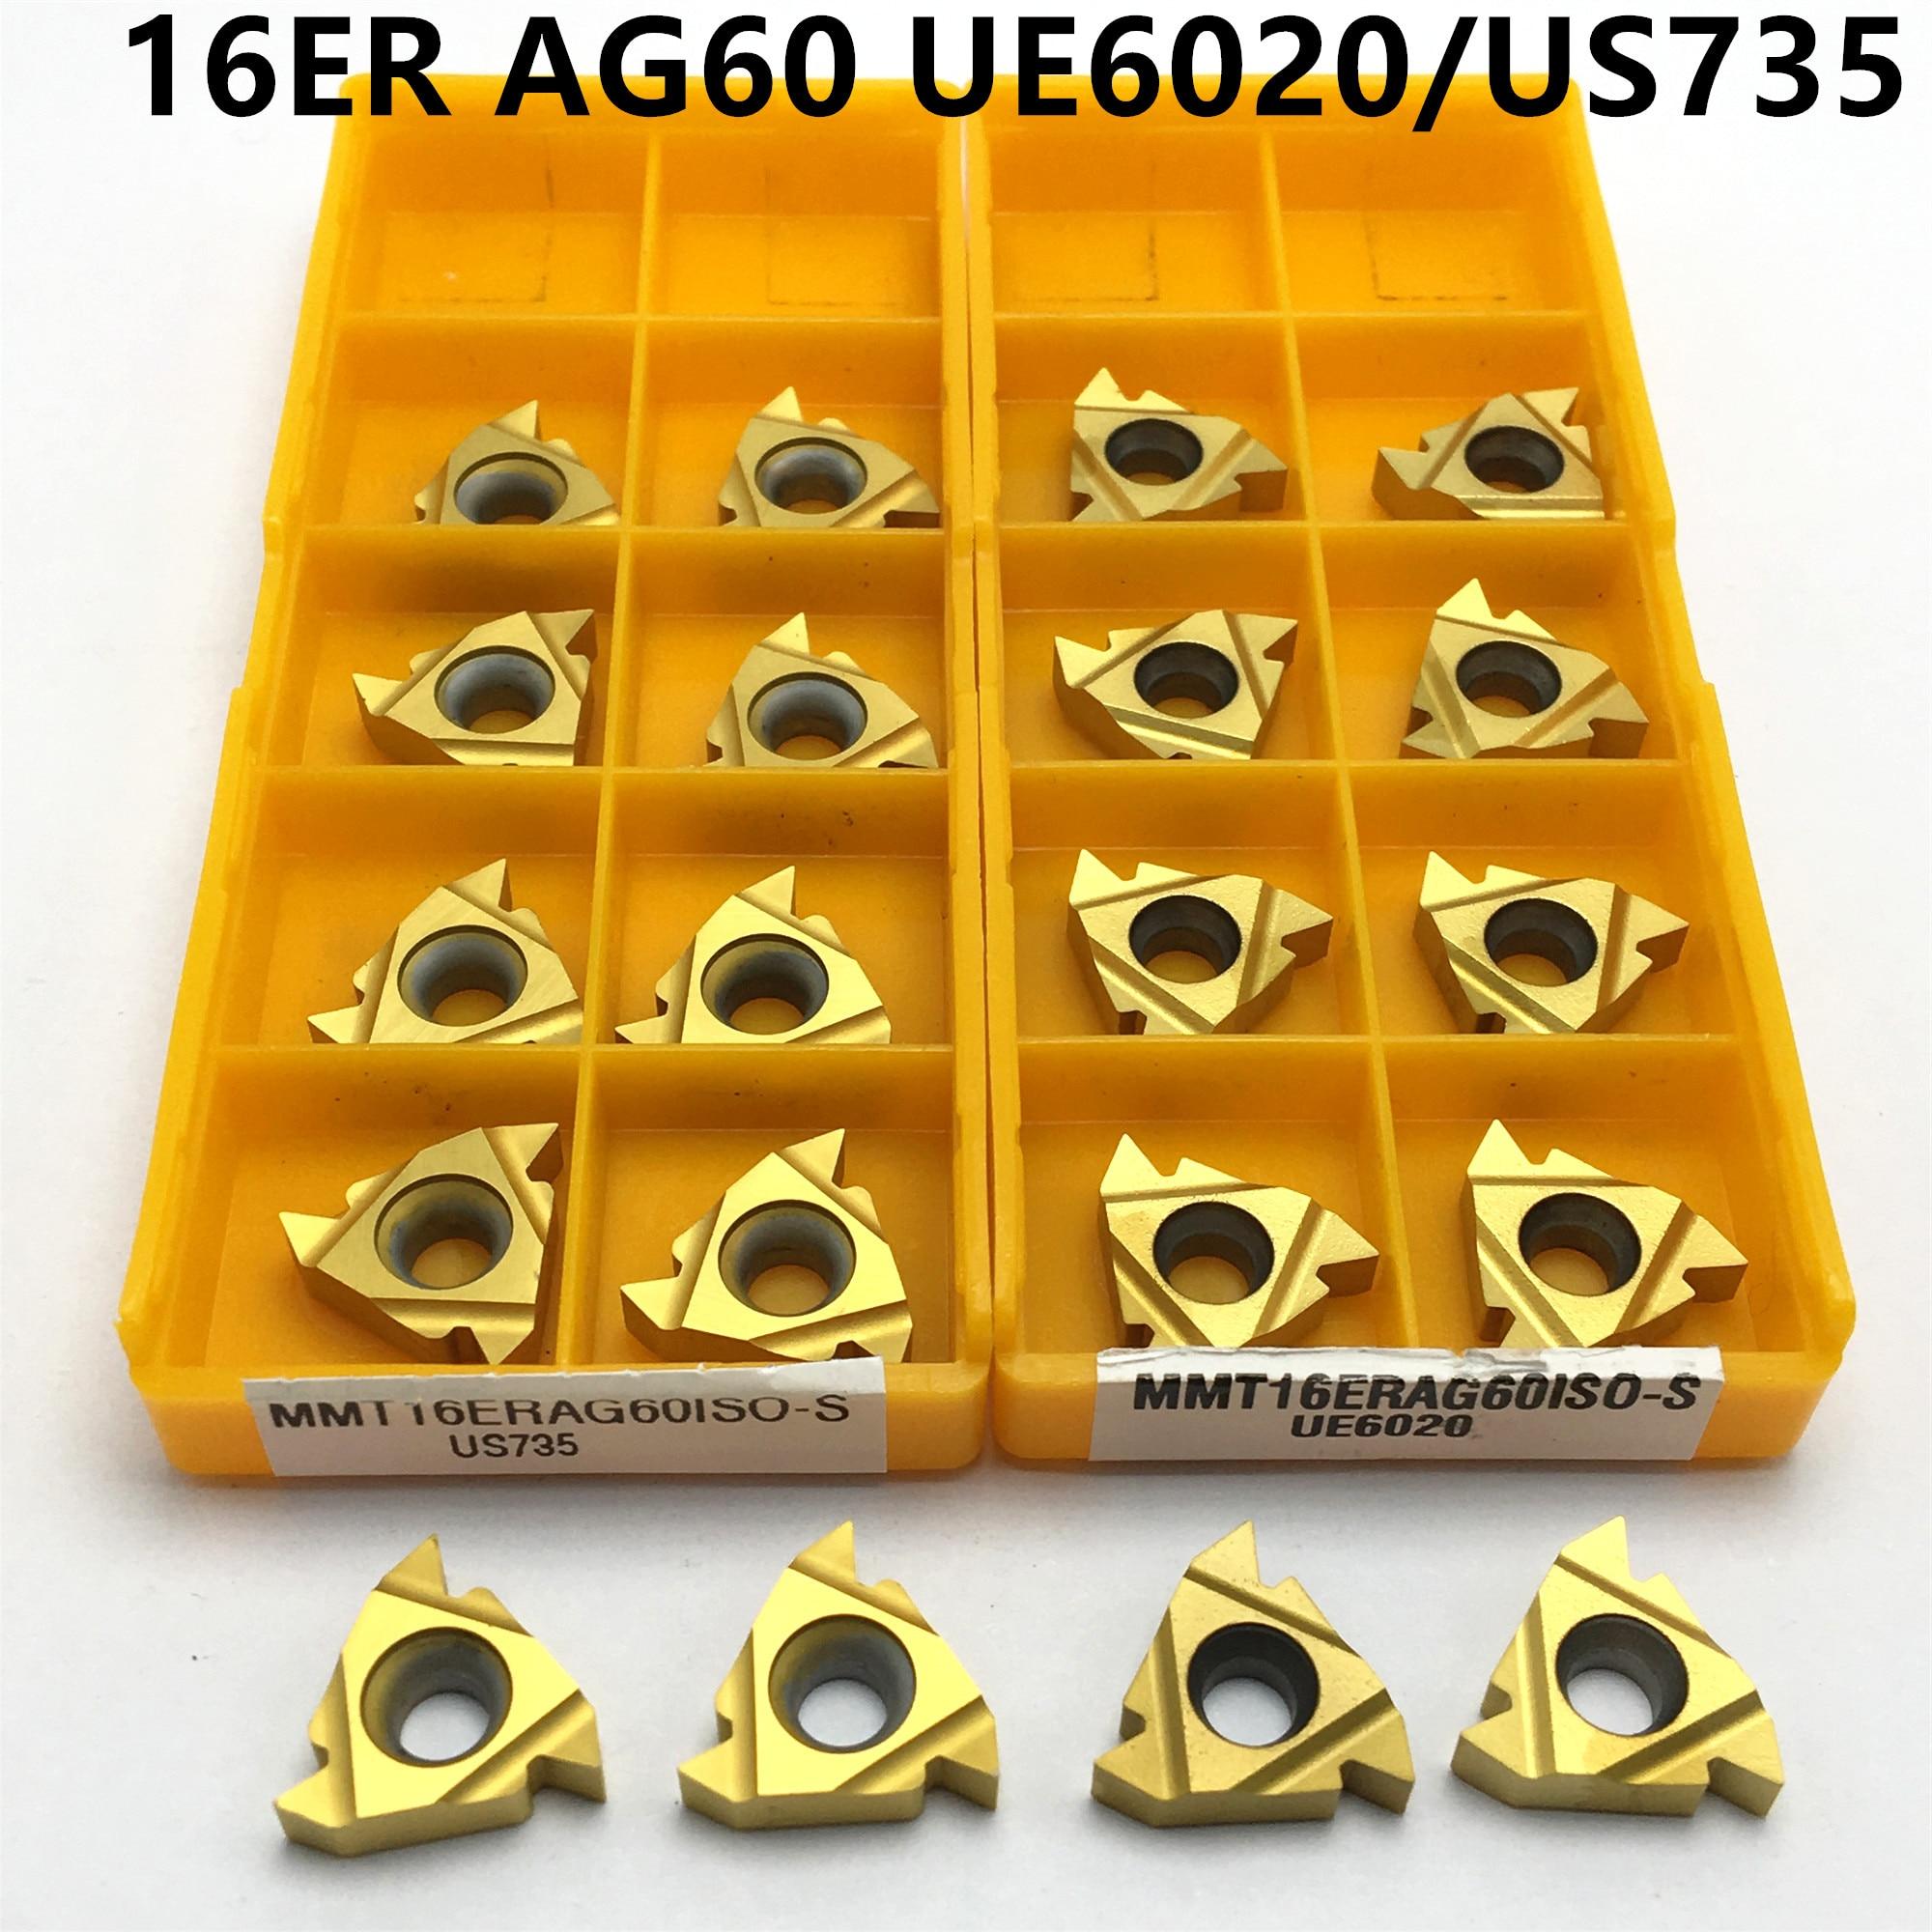 MMT16ER AG60 UE6020 / US735 11ER 11IR Hard Alloy Thread Turning Tool Cutting Tool Milling Cutter CNC Tool 16ERAG60 Thread Cutter